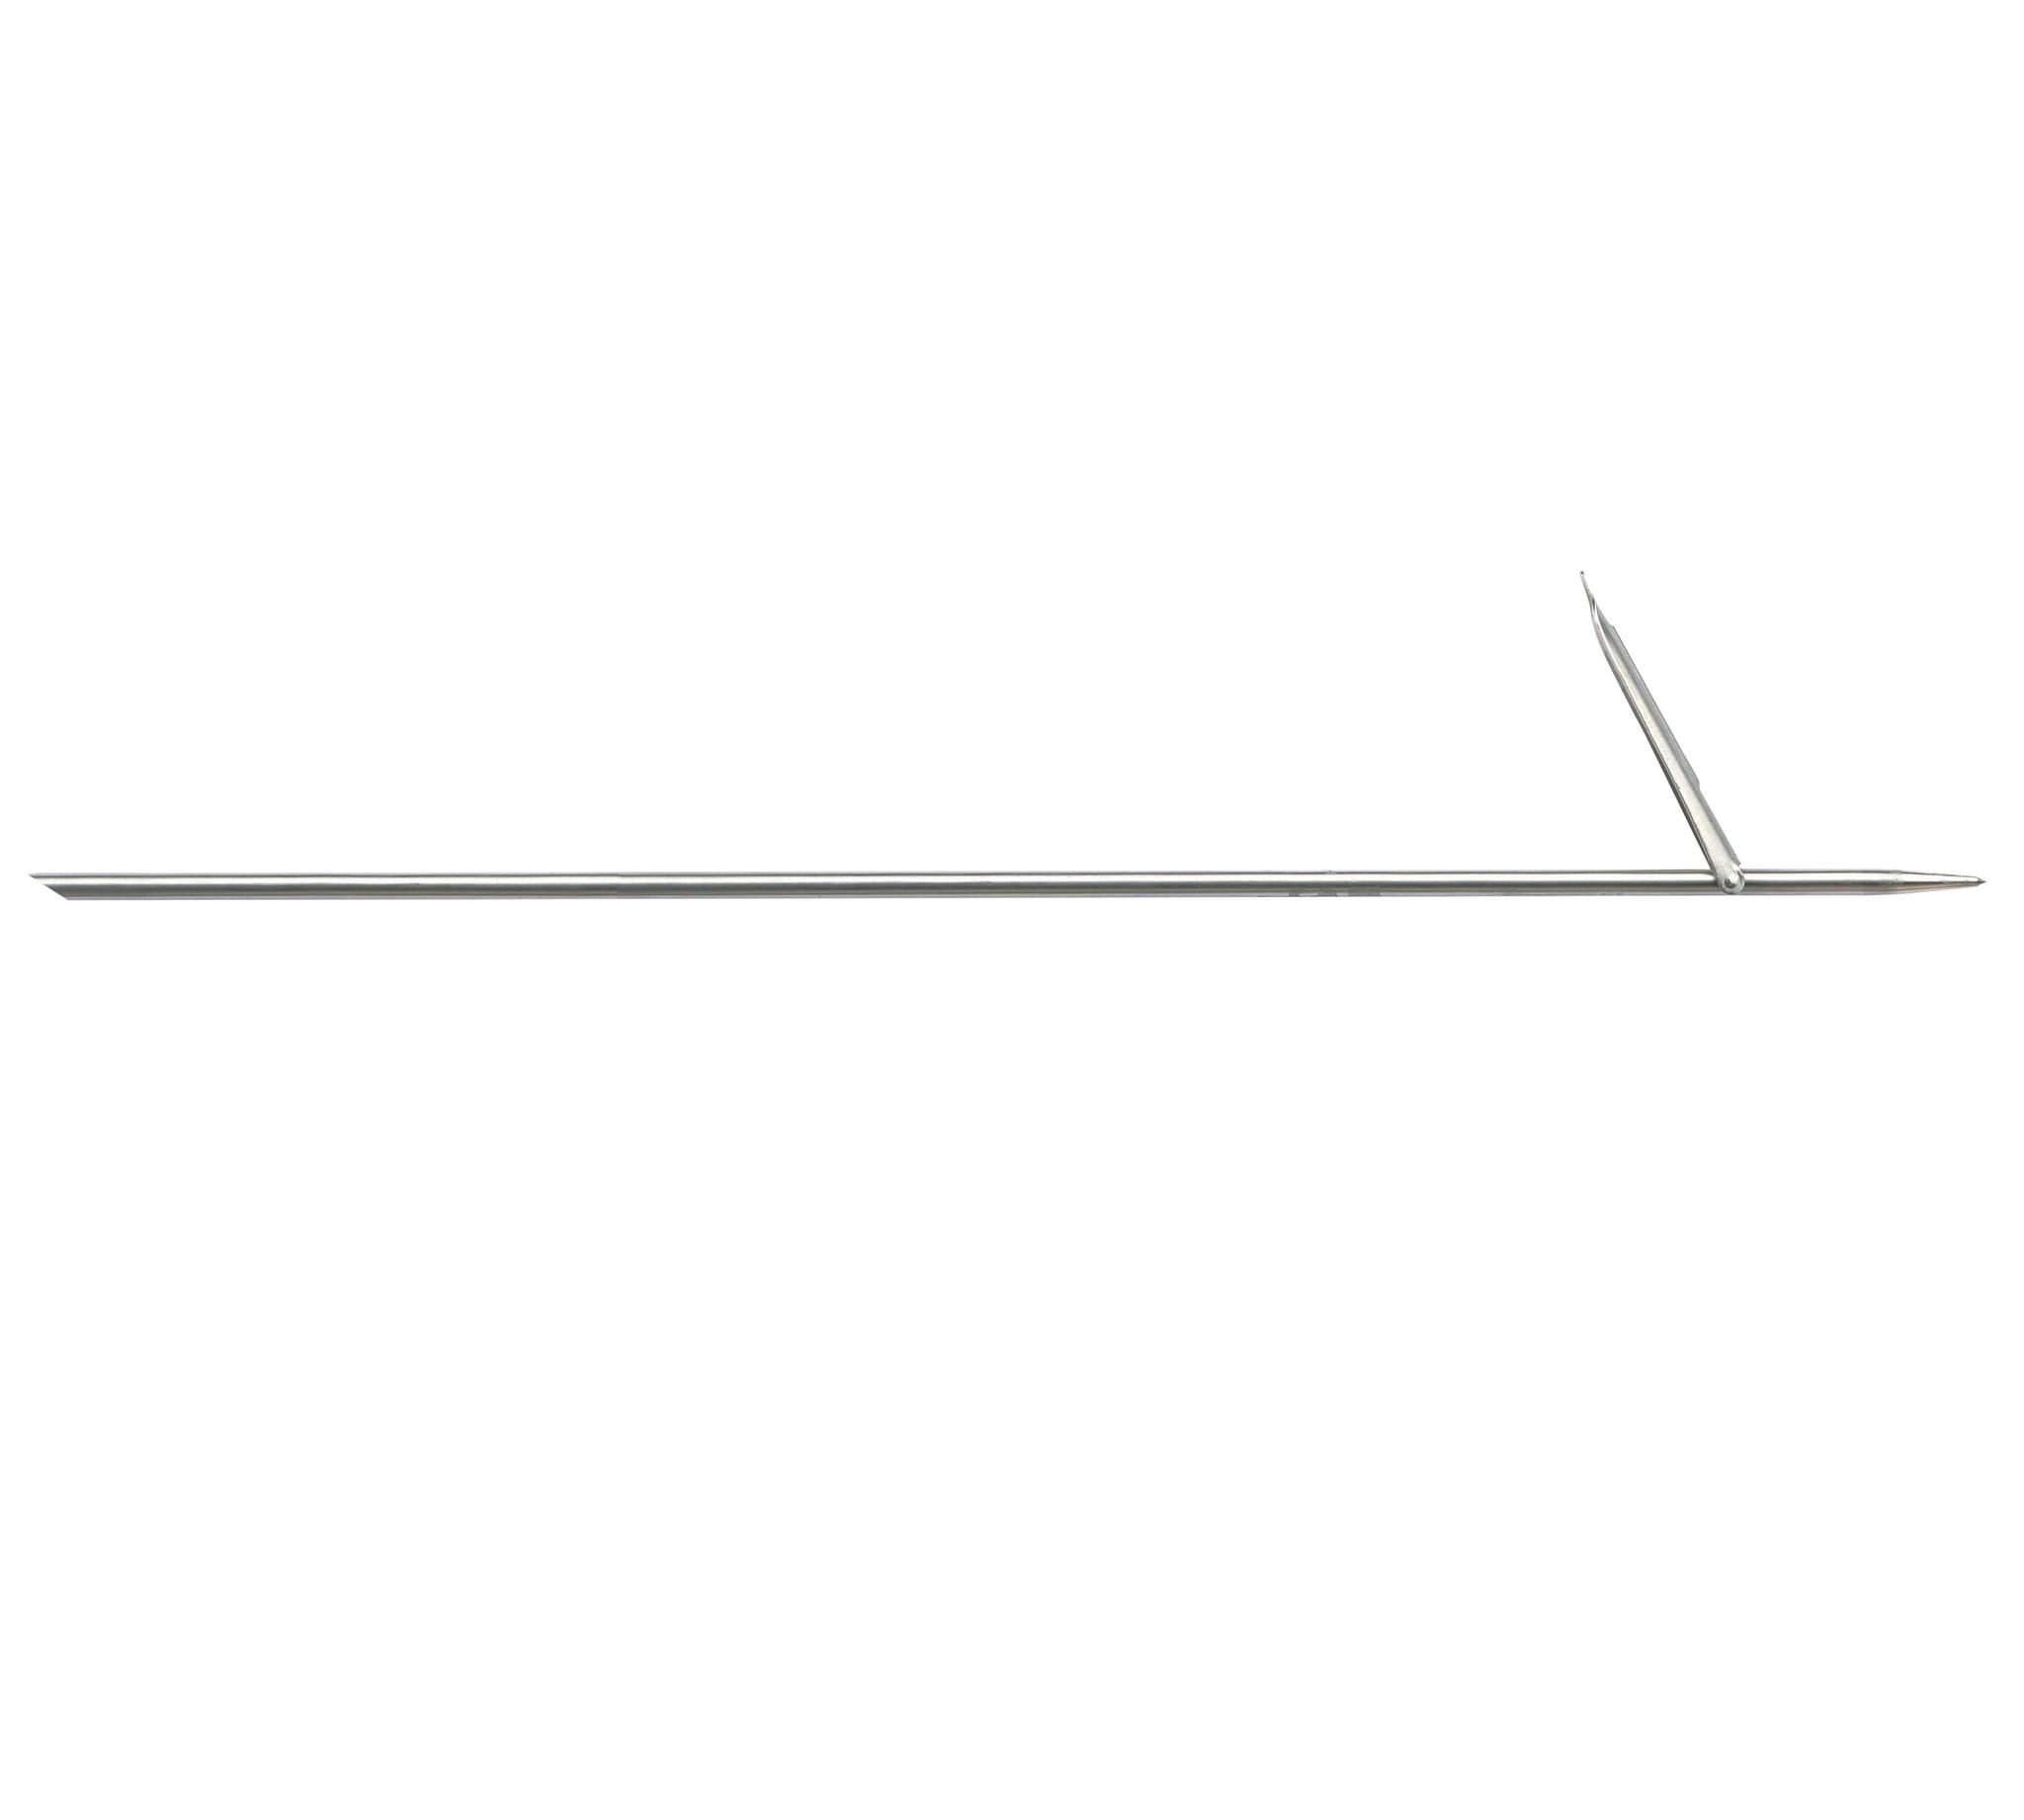 Inox 174 PH Shaft Ø 6,0mm